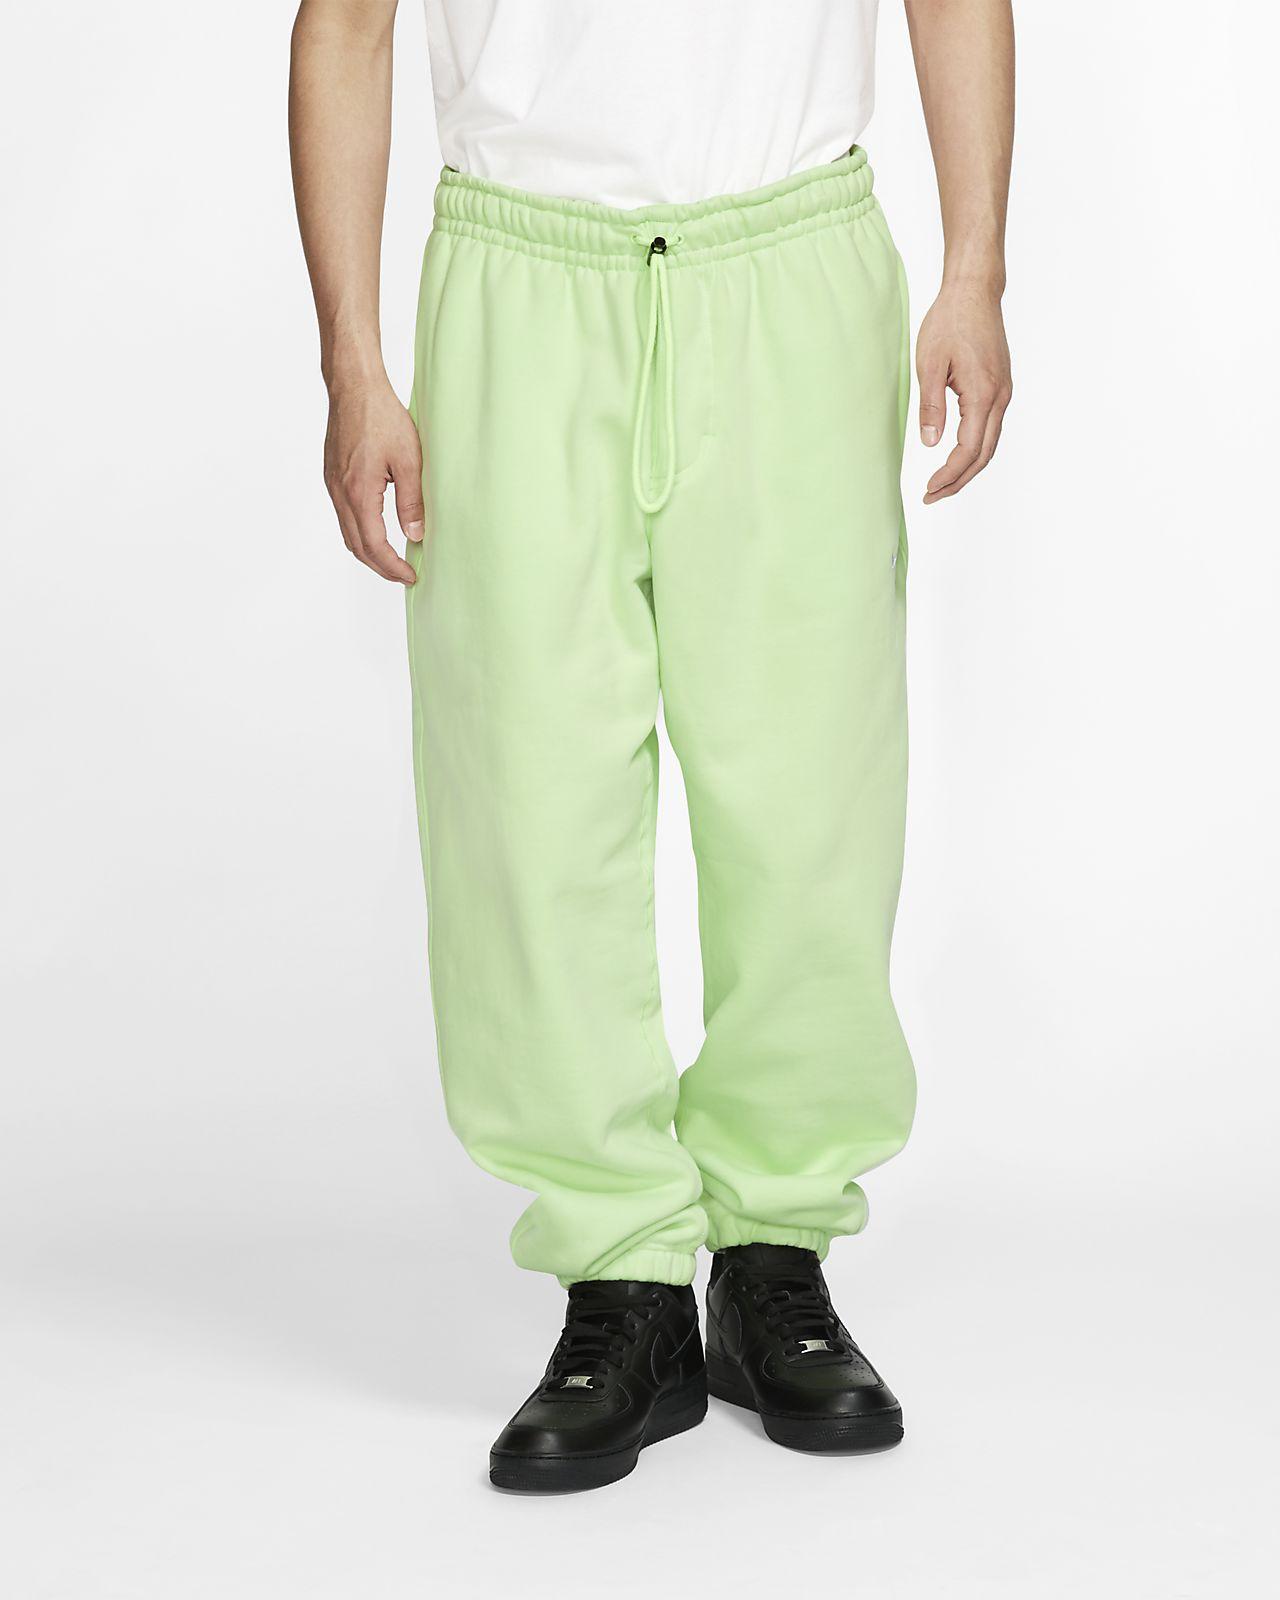 Pantaloni in fleece NikeLab Collection - Uomo